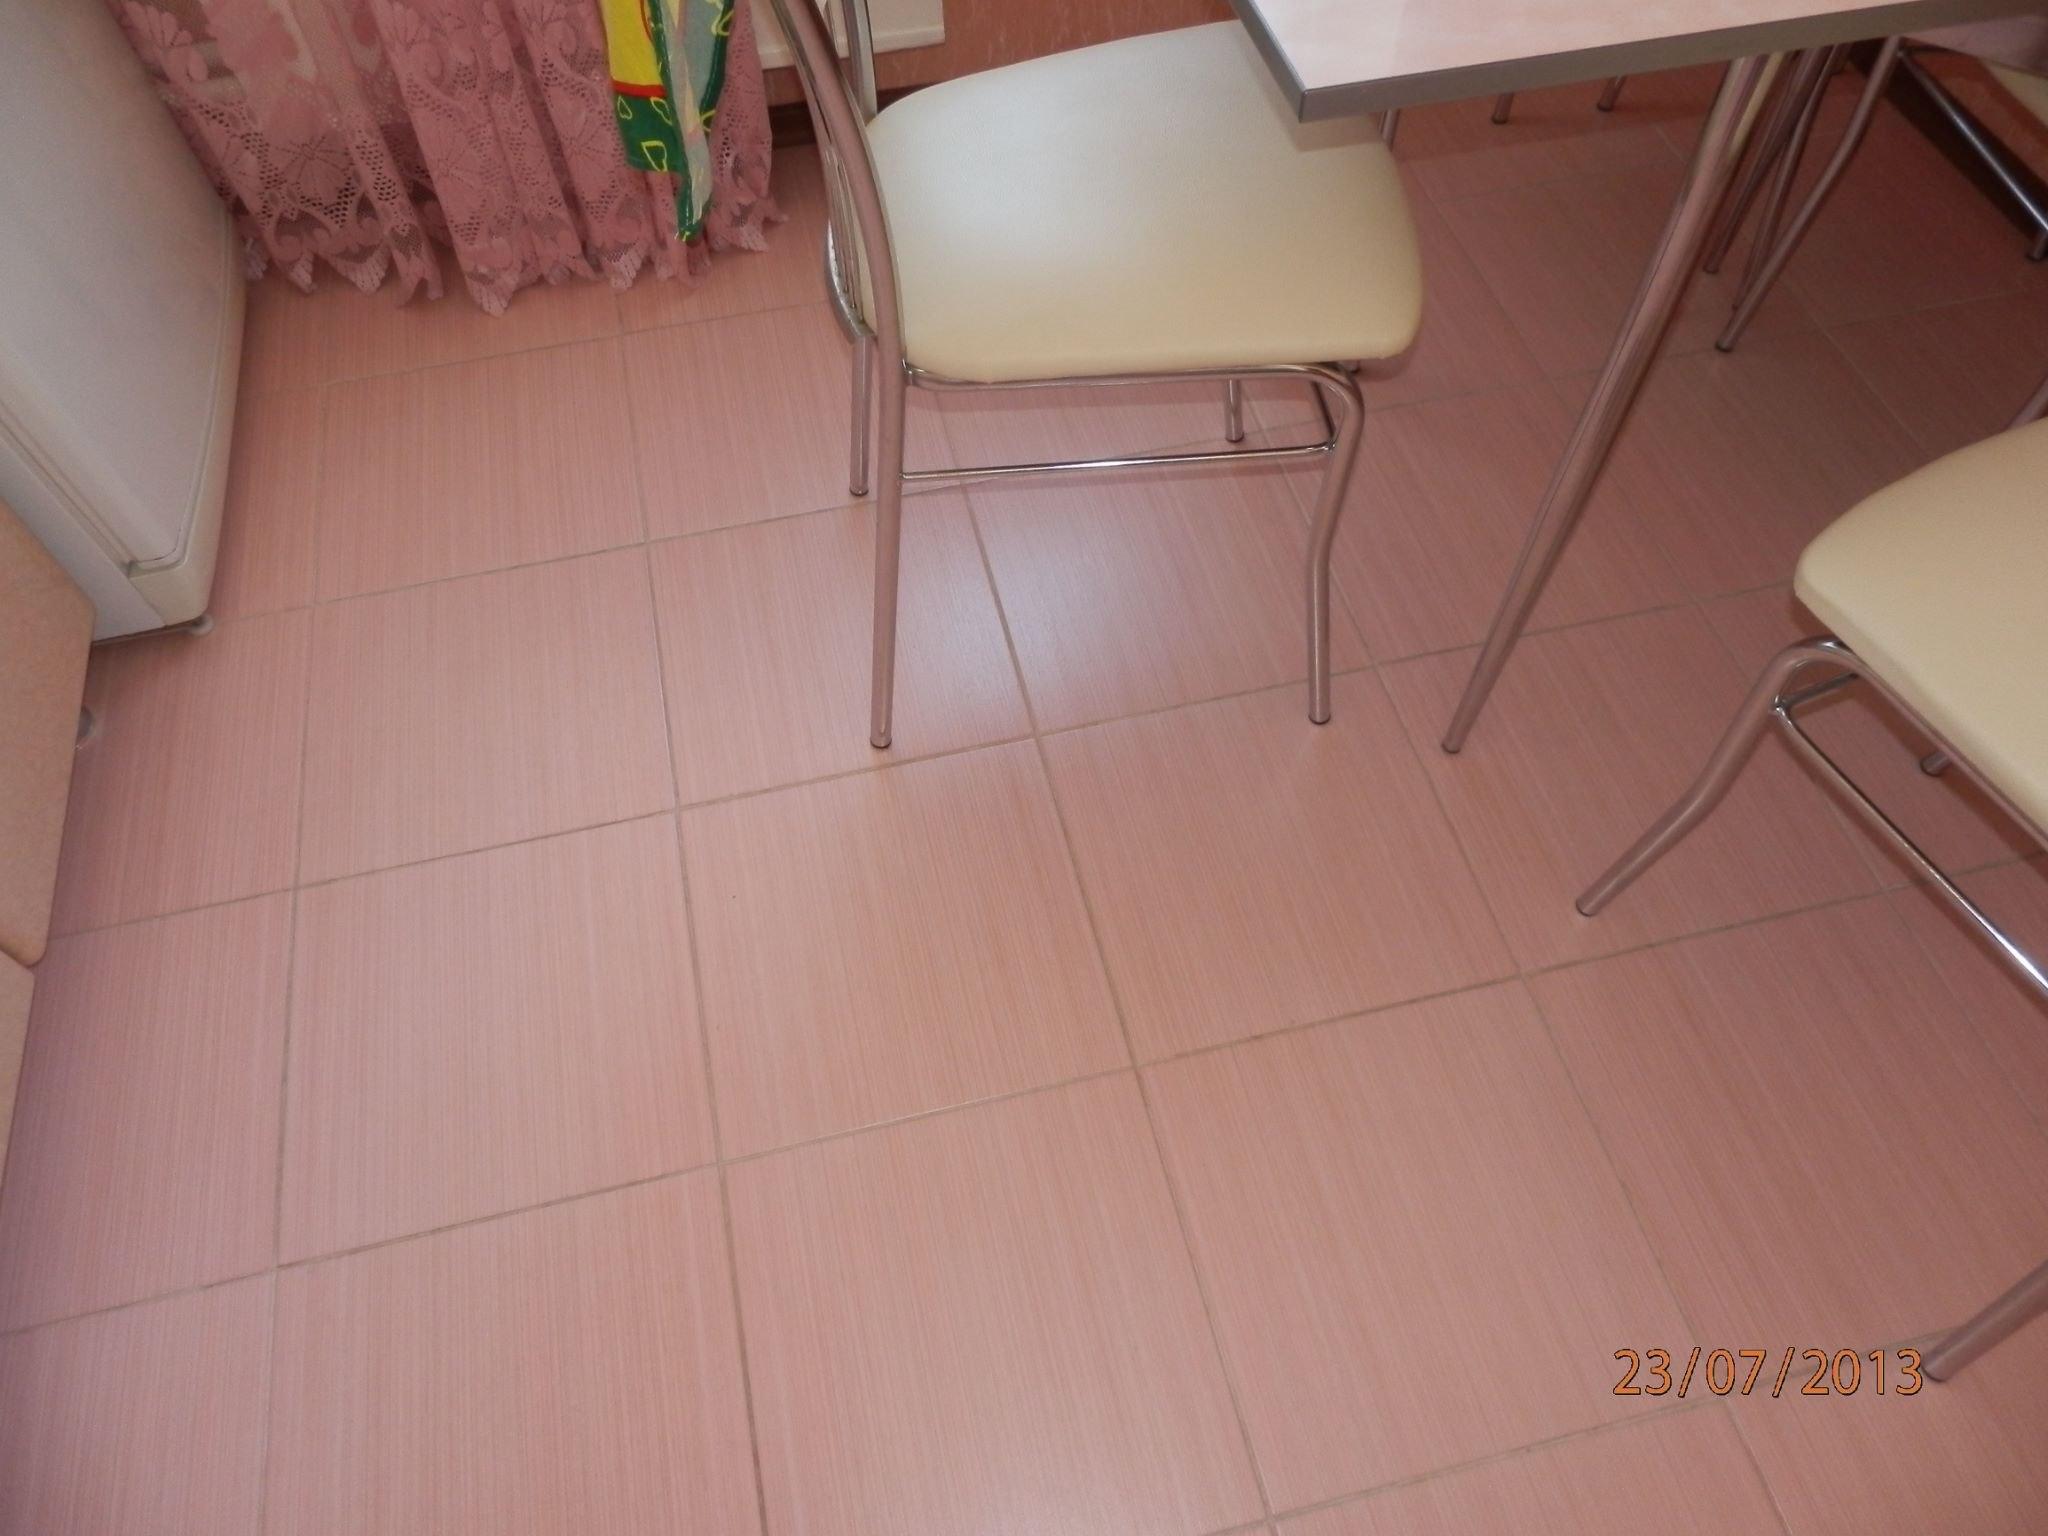 Продажа квартир: 1-комнатная квартира, Майкоп, ул. Гоголя, 21, фото 1